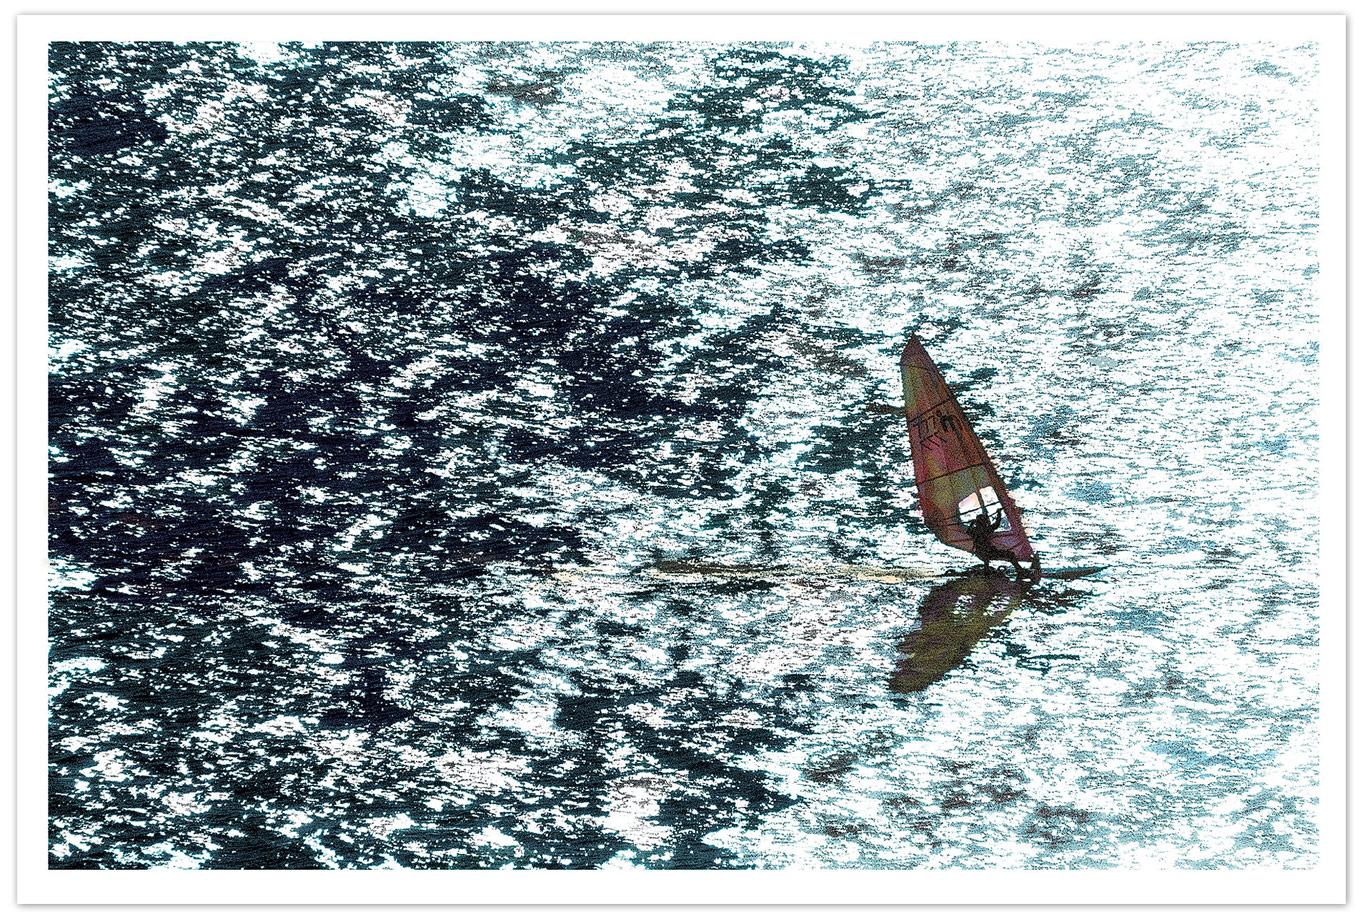 american_windsurfer-4.2_marthas-vineyard-windsurfing-challenge1